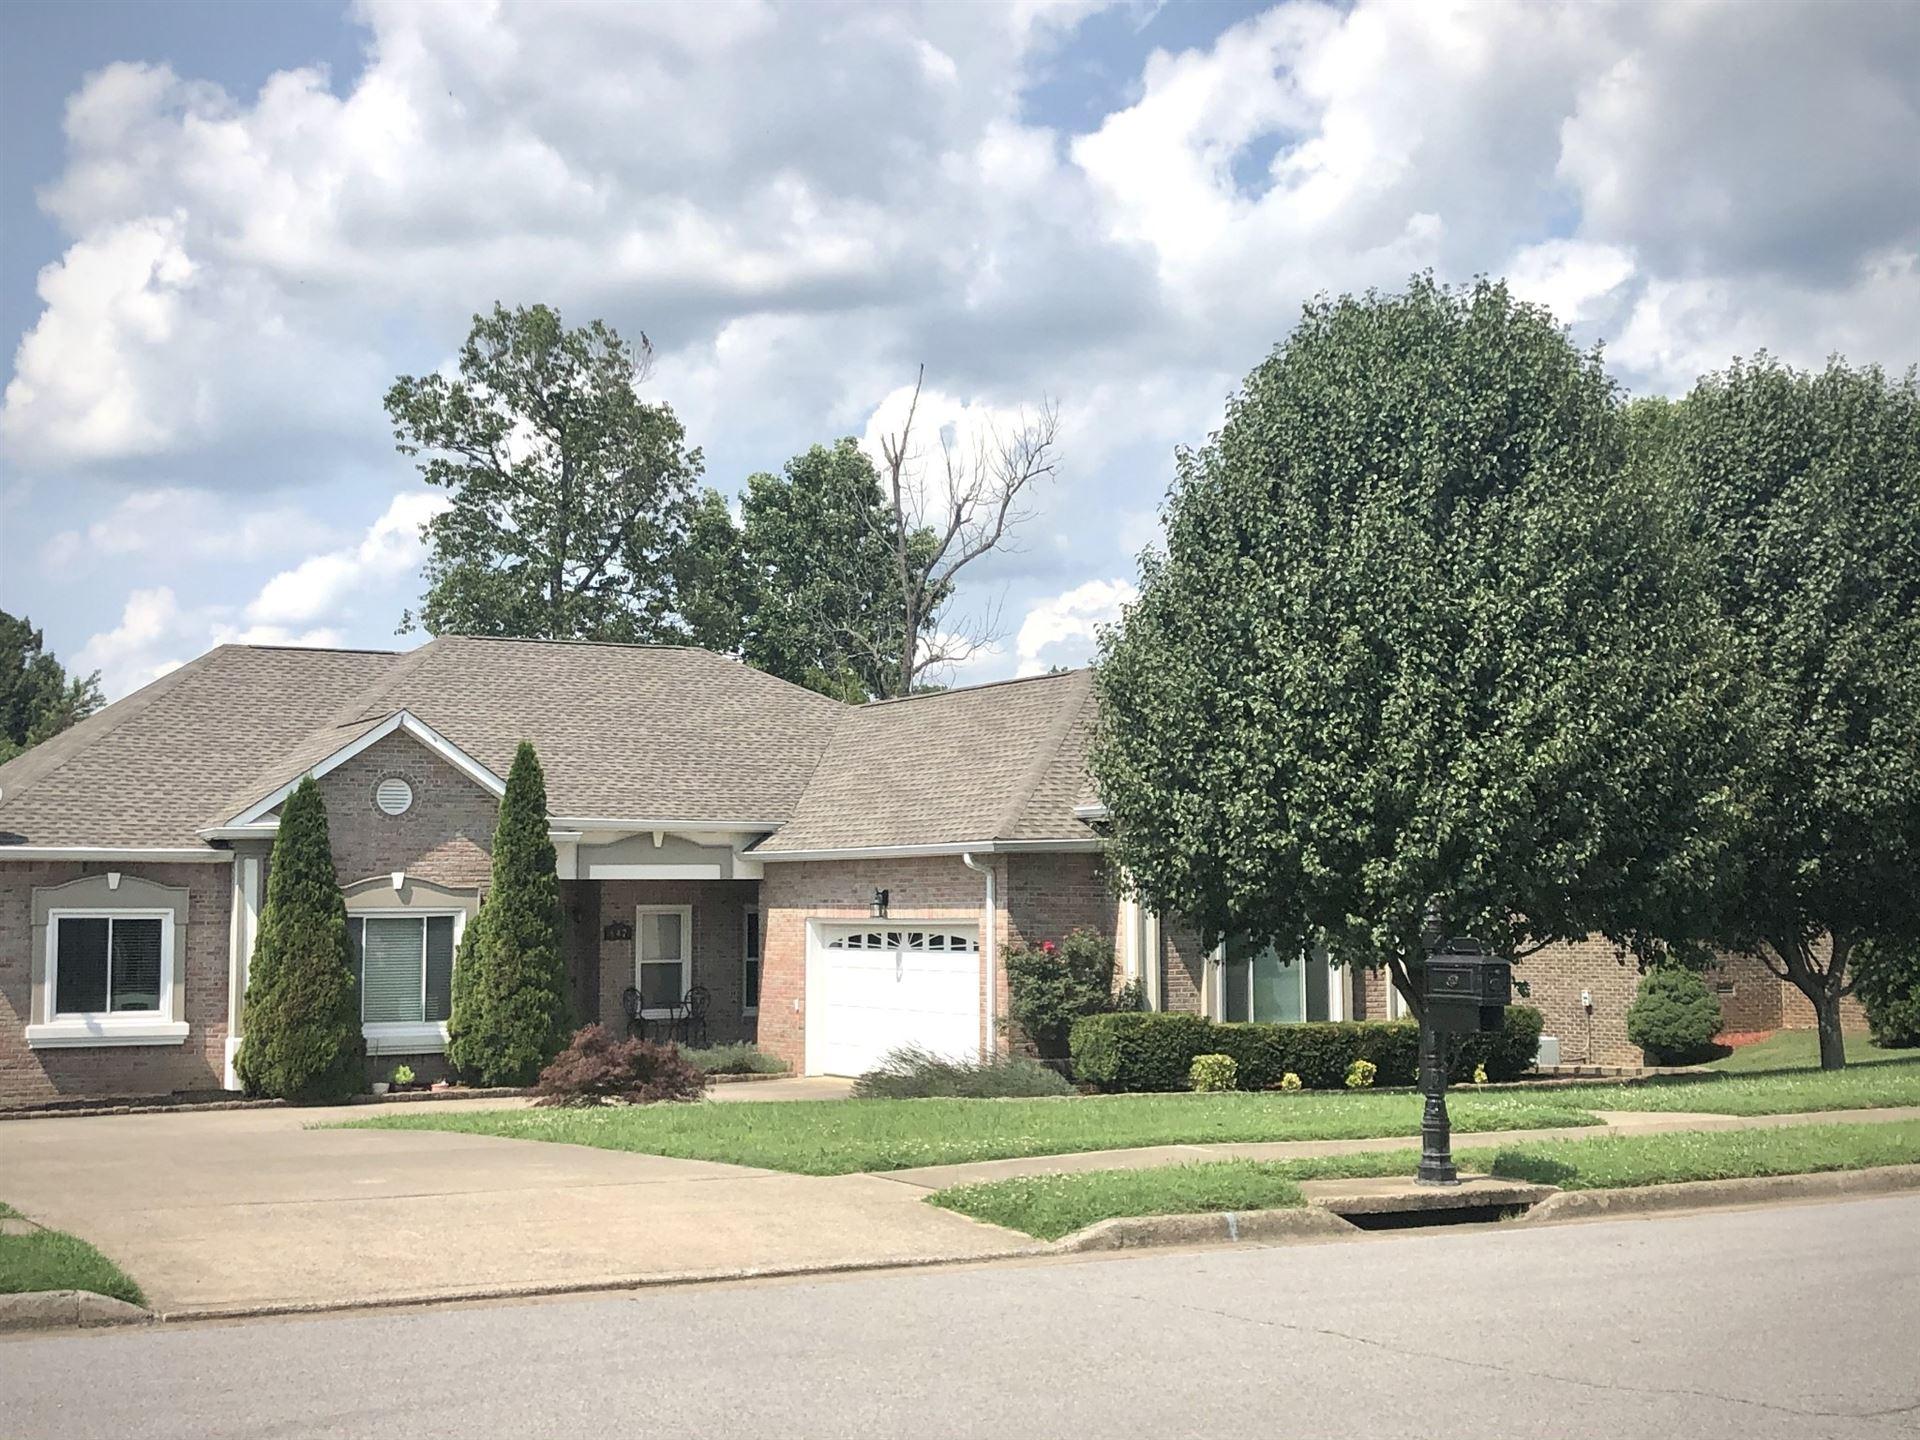 647 Potomac Dr, Clarksville, TN 37043 - MLS#: 2270628